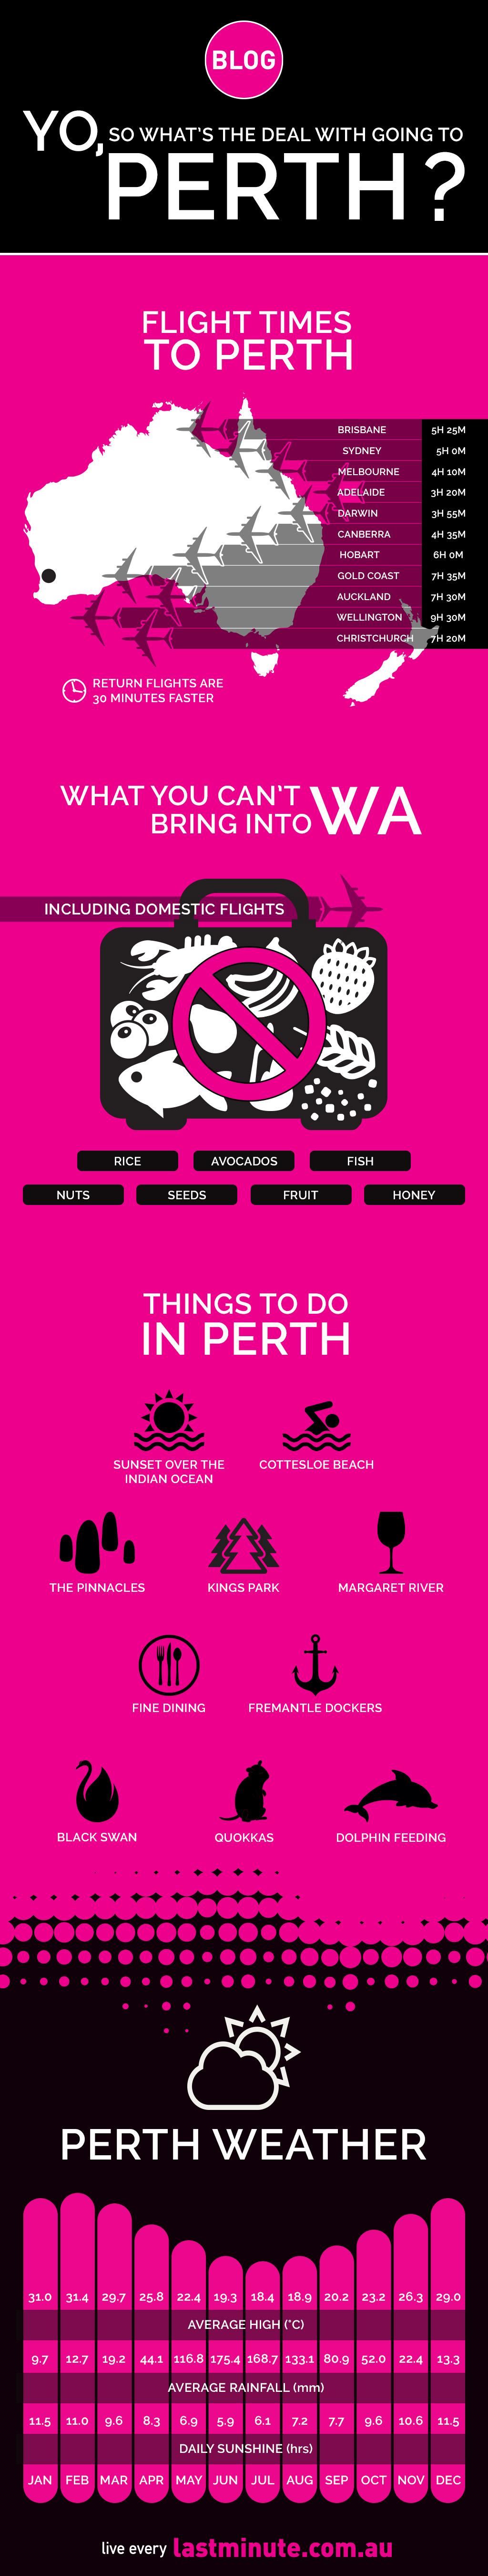 Perth_Infographic_V007